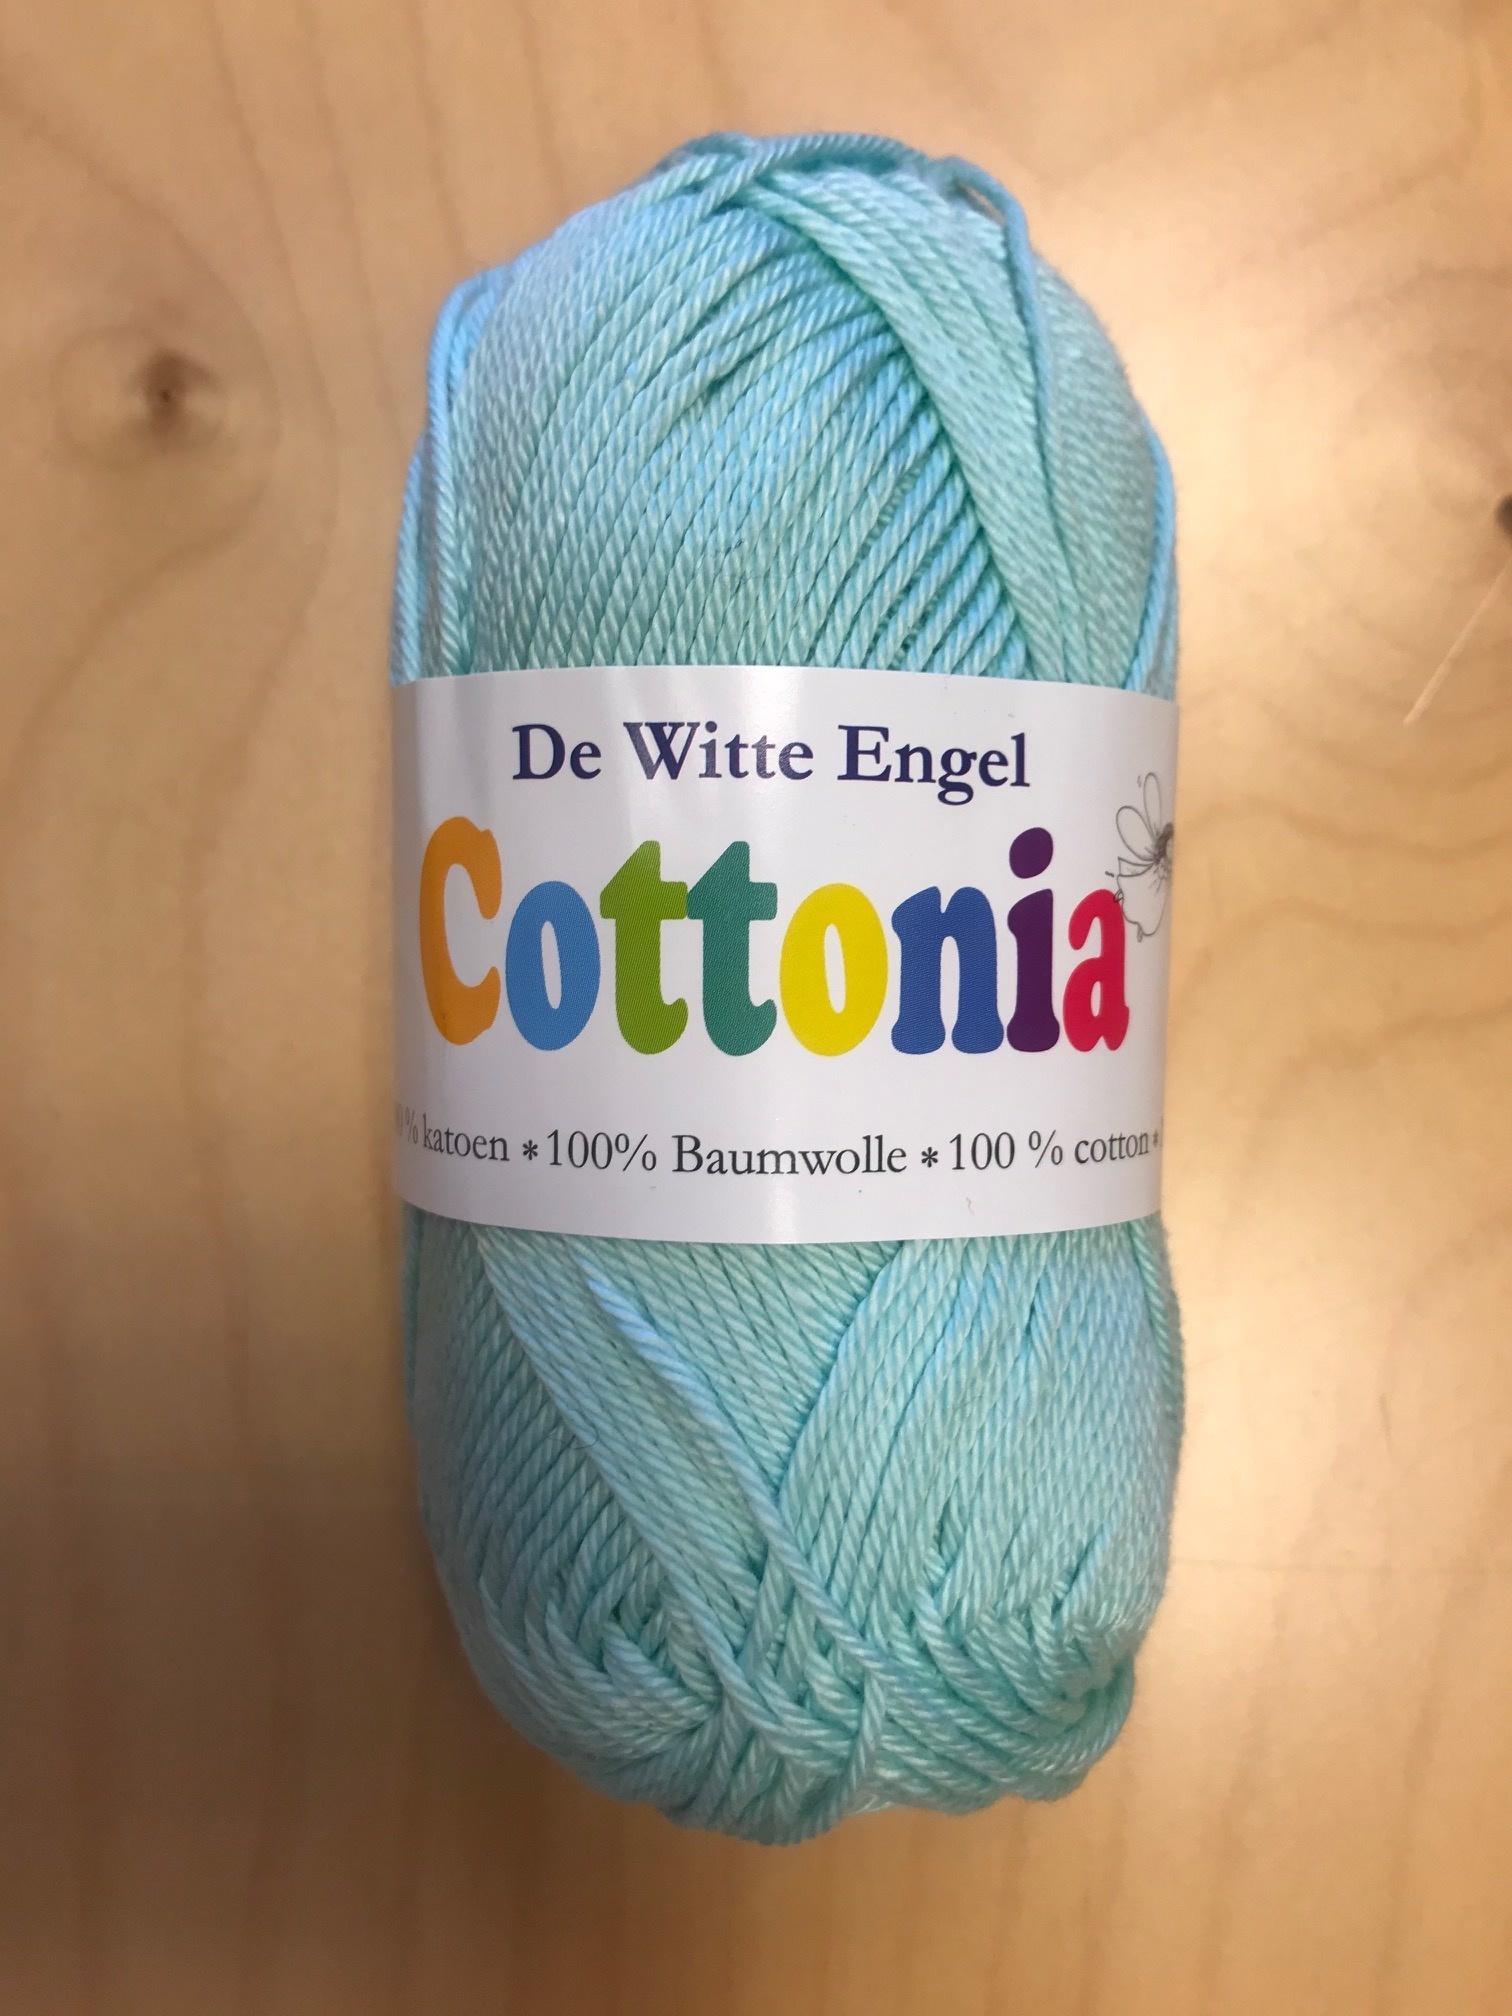 De Witte Engel De Witte Engel Cottonia brei- en haakkatoen - Licht Turquoise 129